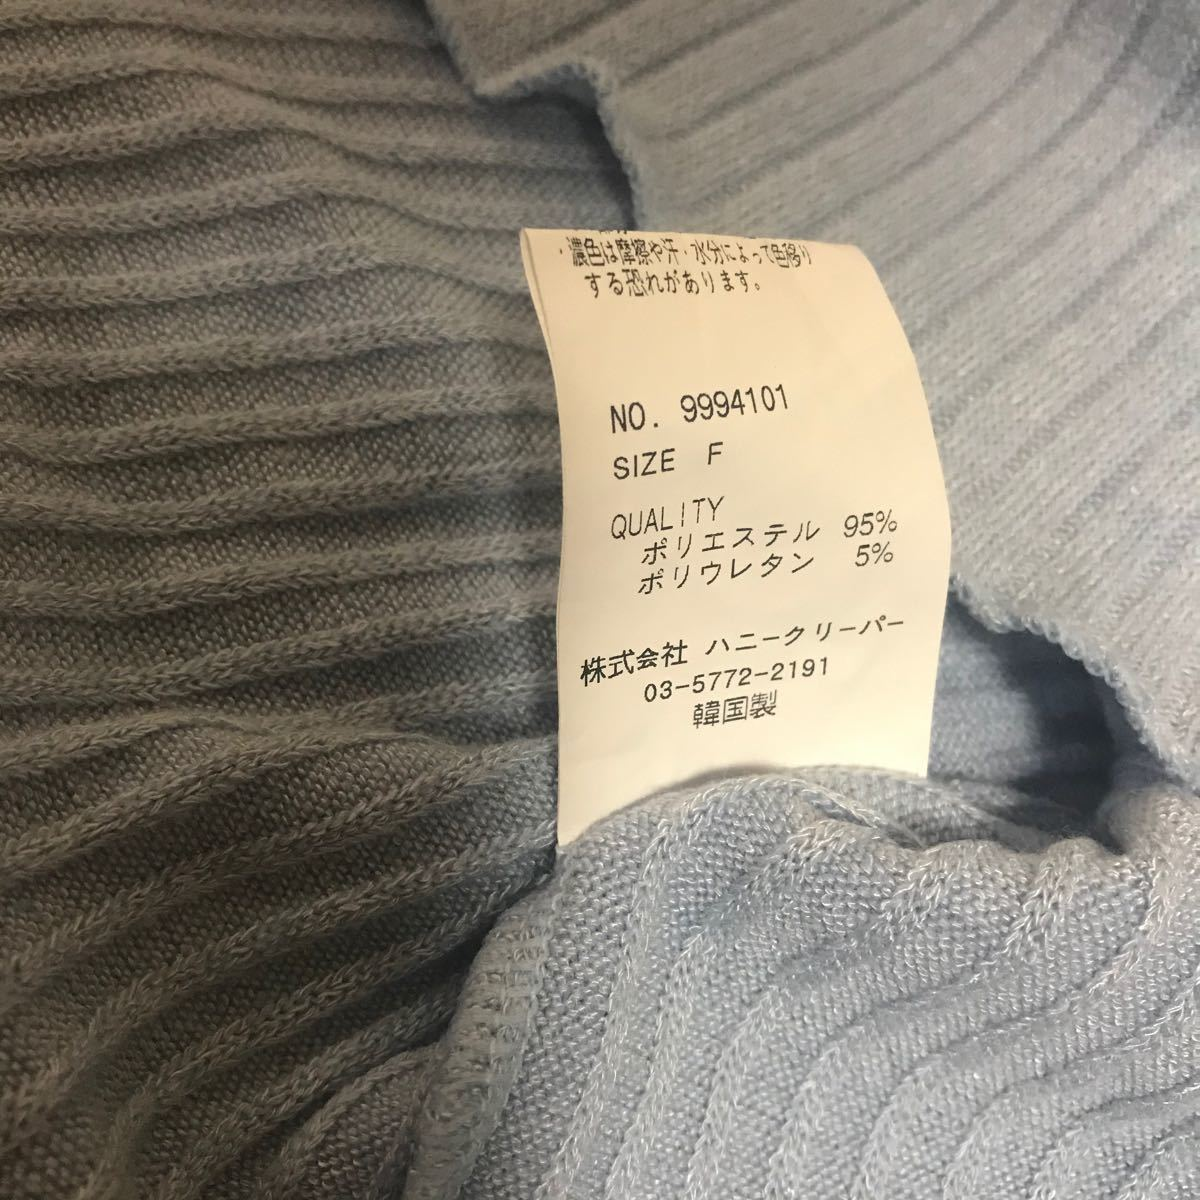 【fifth】 ニット/セーター ロンT サマーニット 薄手ニット オフィス